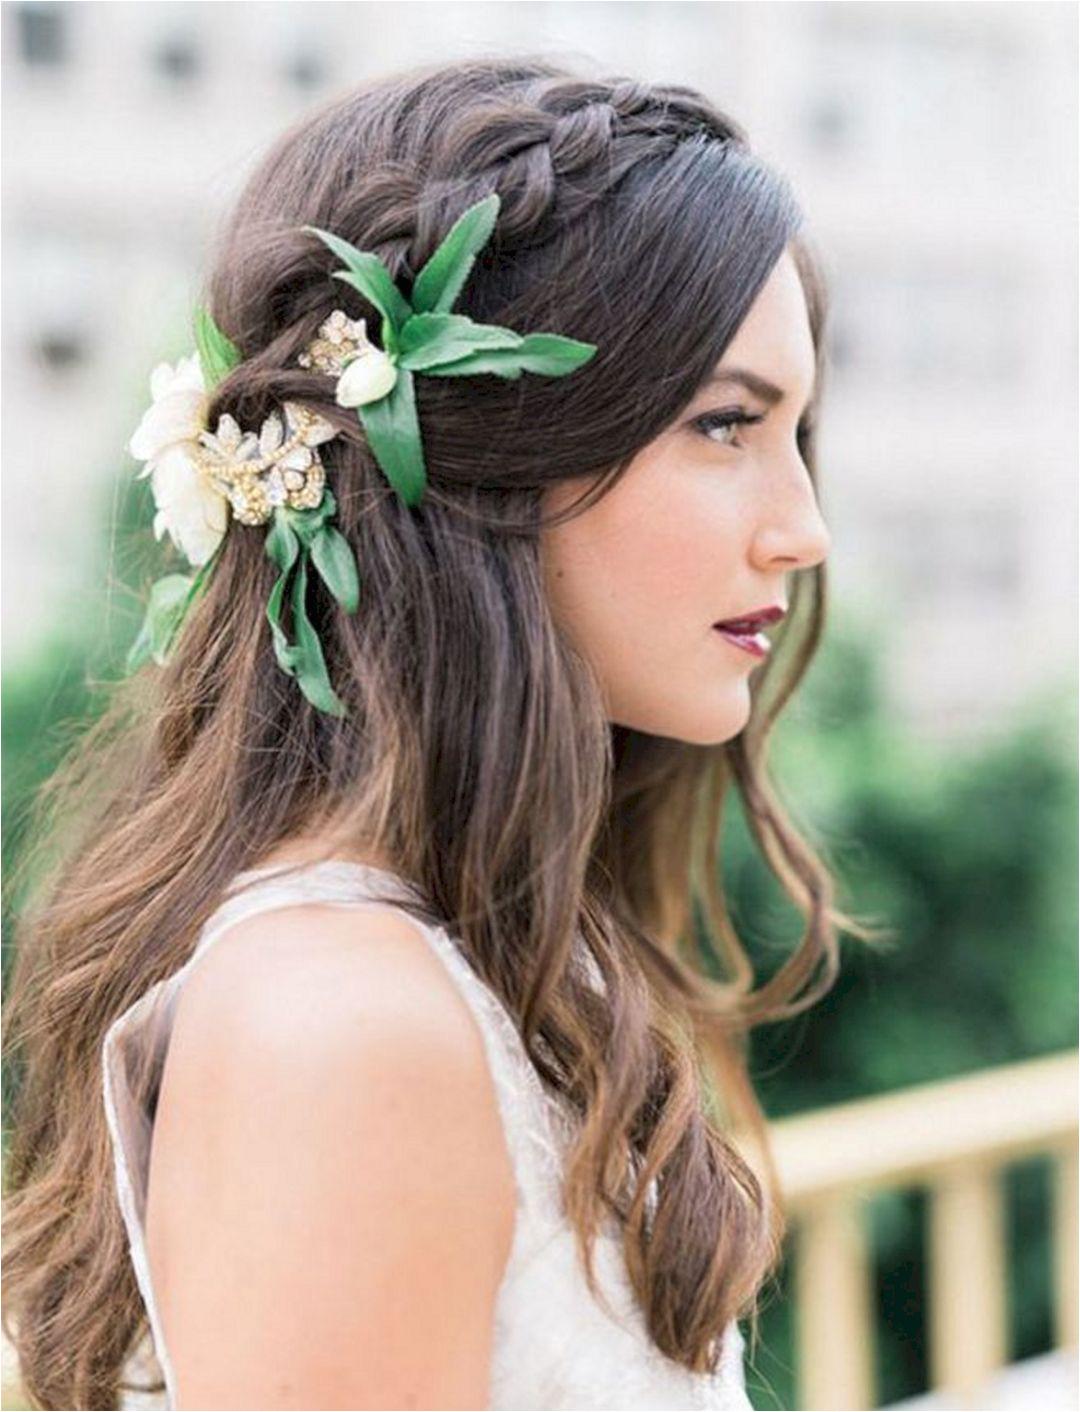 Gloomy 80 Beautiful and Adorable Half Up Half Down Wedding Hairstyles Ideas s